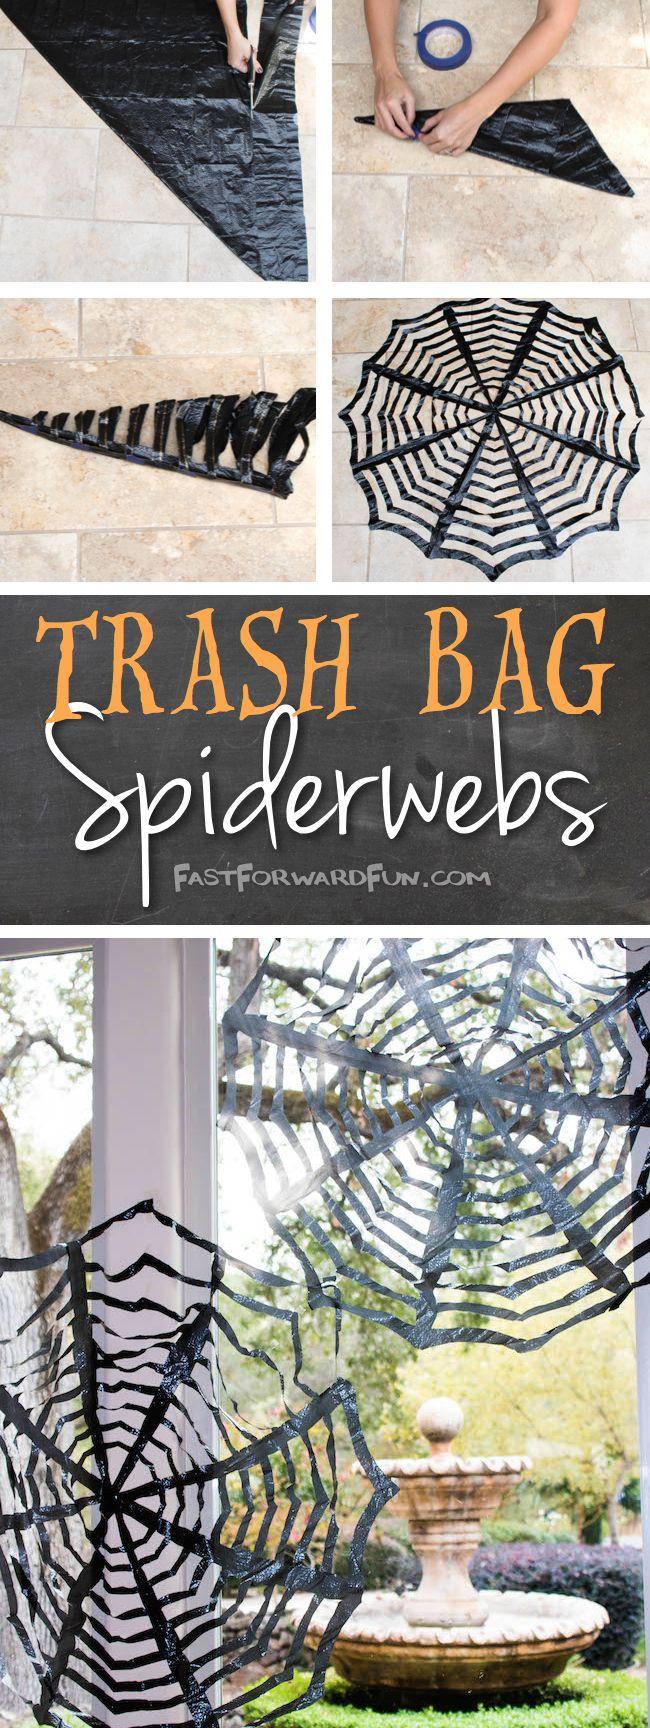 Lisa b mrs s halloween decorating with kids in three easy steps - Easy Diy Trash Bag Spiderwebs Halloween Decorations Tutorial Fast Forward Fun Spooktacular Halloween Diys